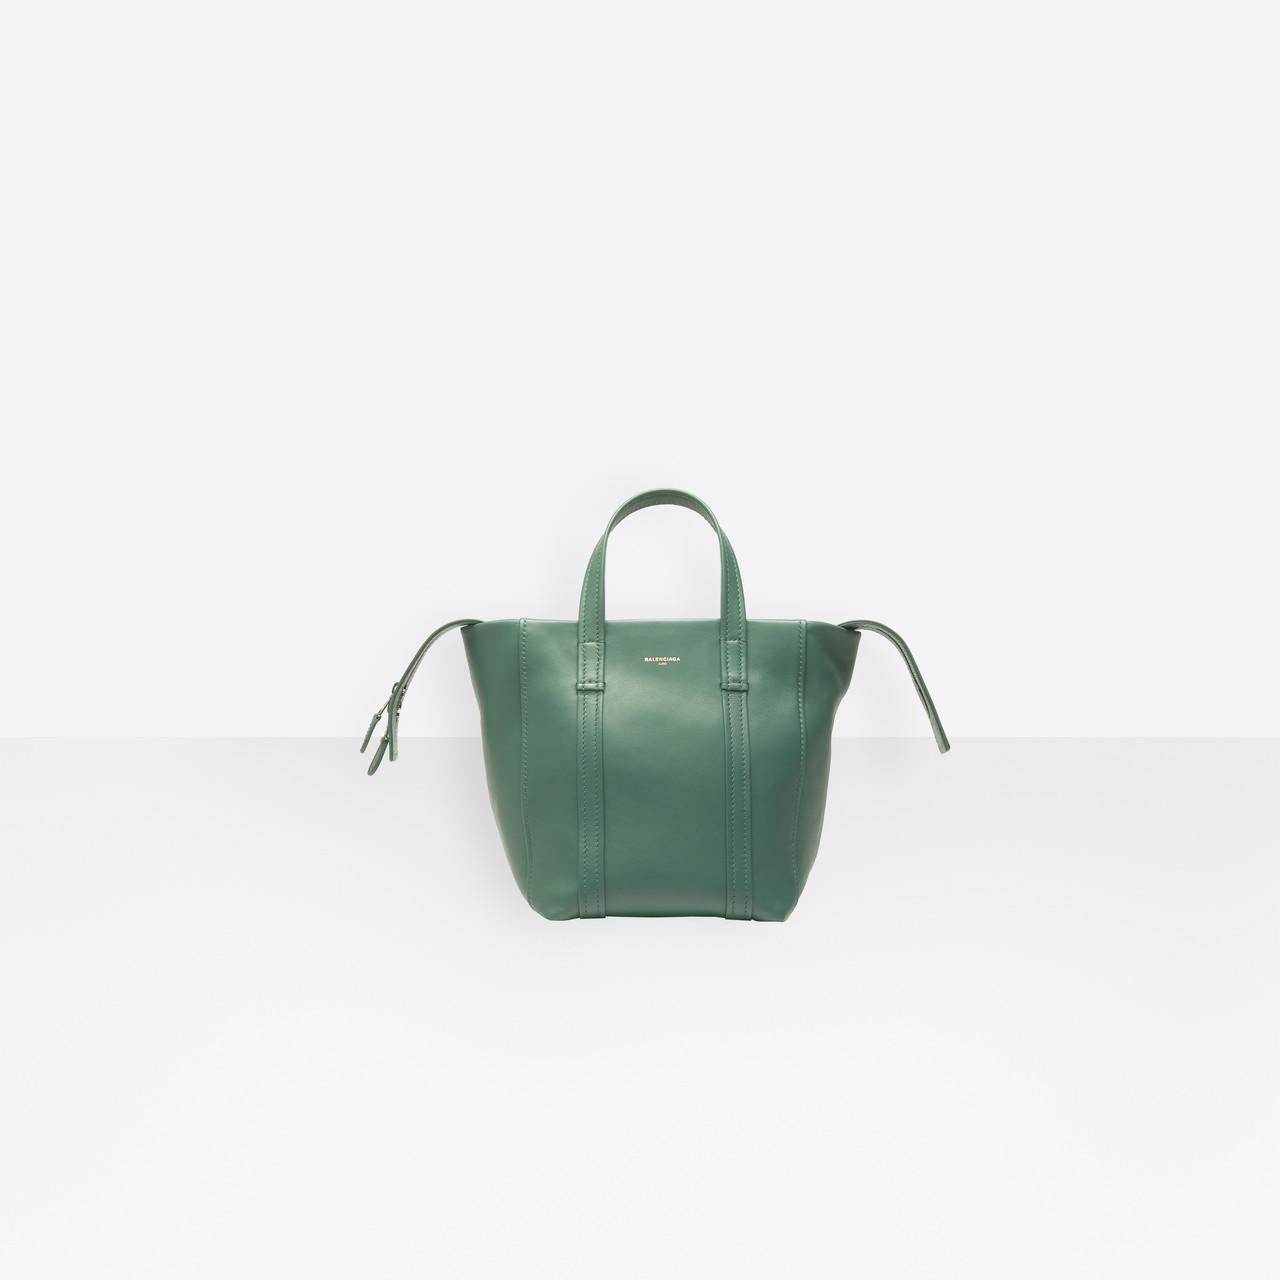 e2a6ccefab Balenciaga Laundry Cabas Xs in Green - Lyst